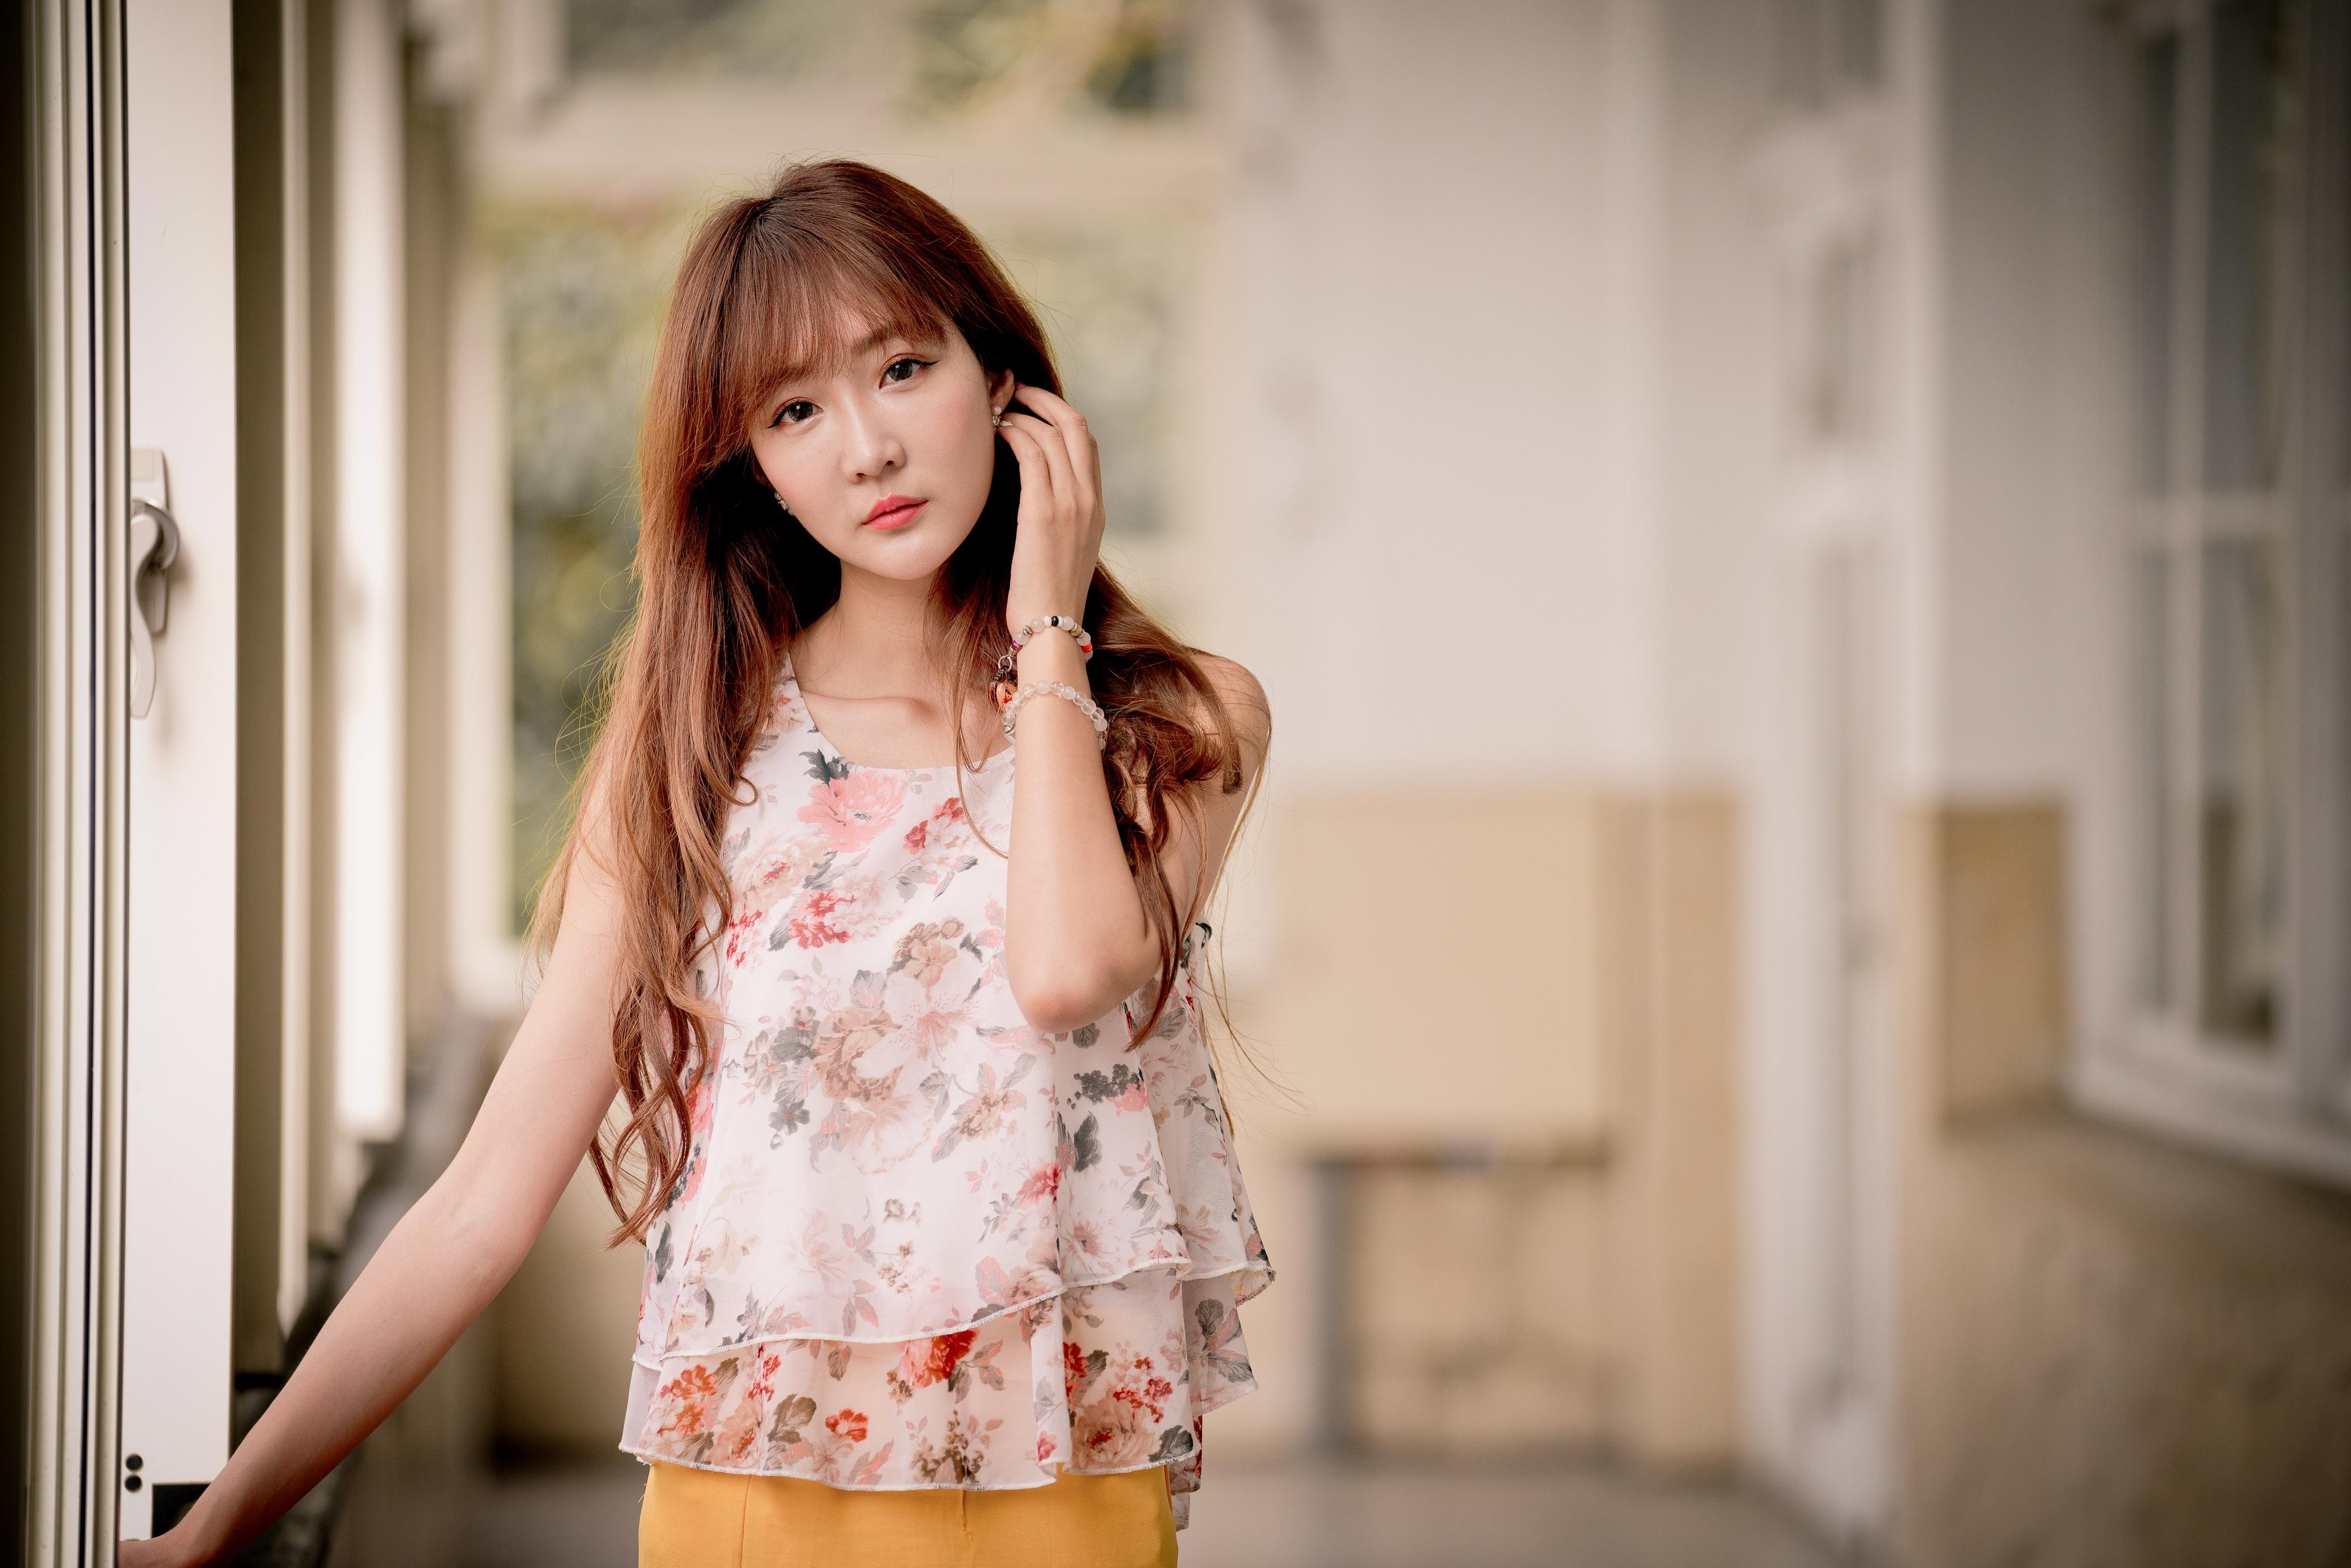 preadolescent-asian-girl-emma-watson-erotica